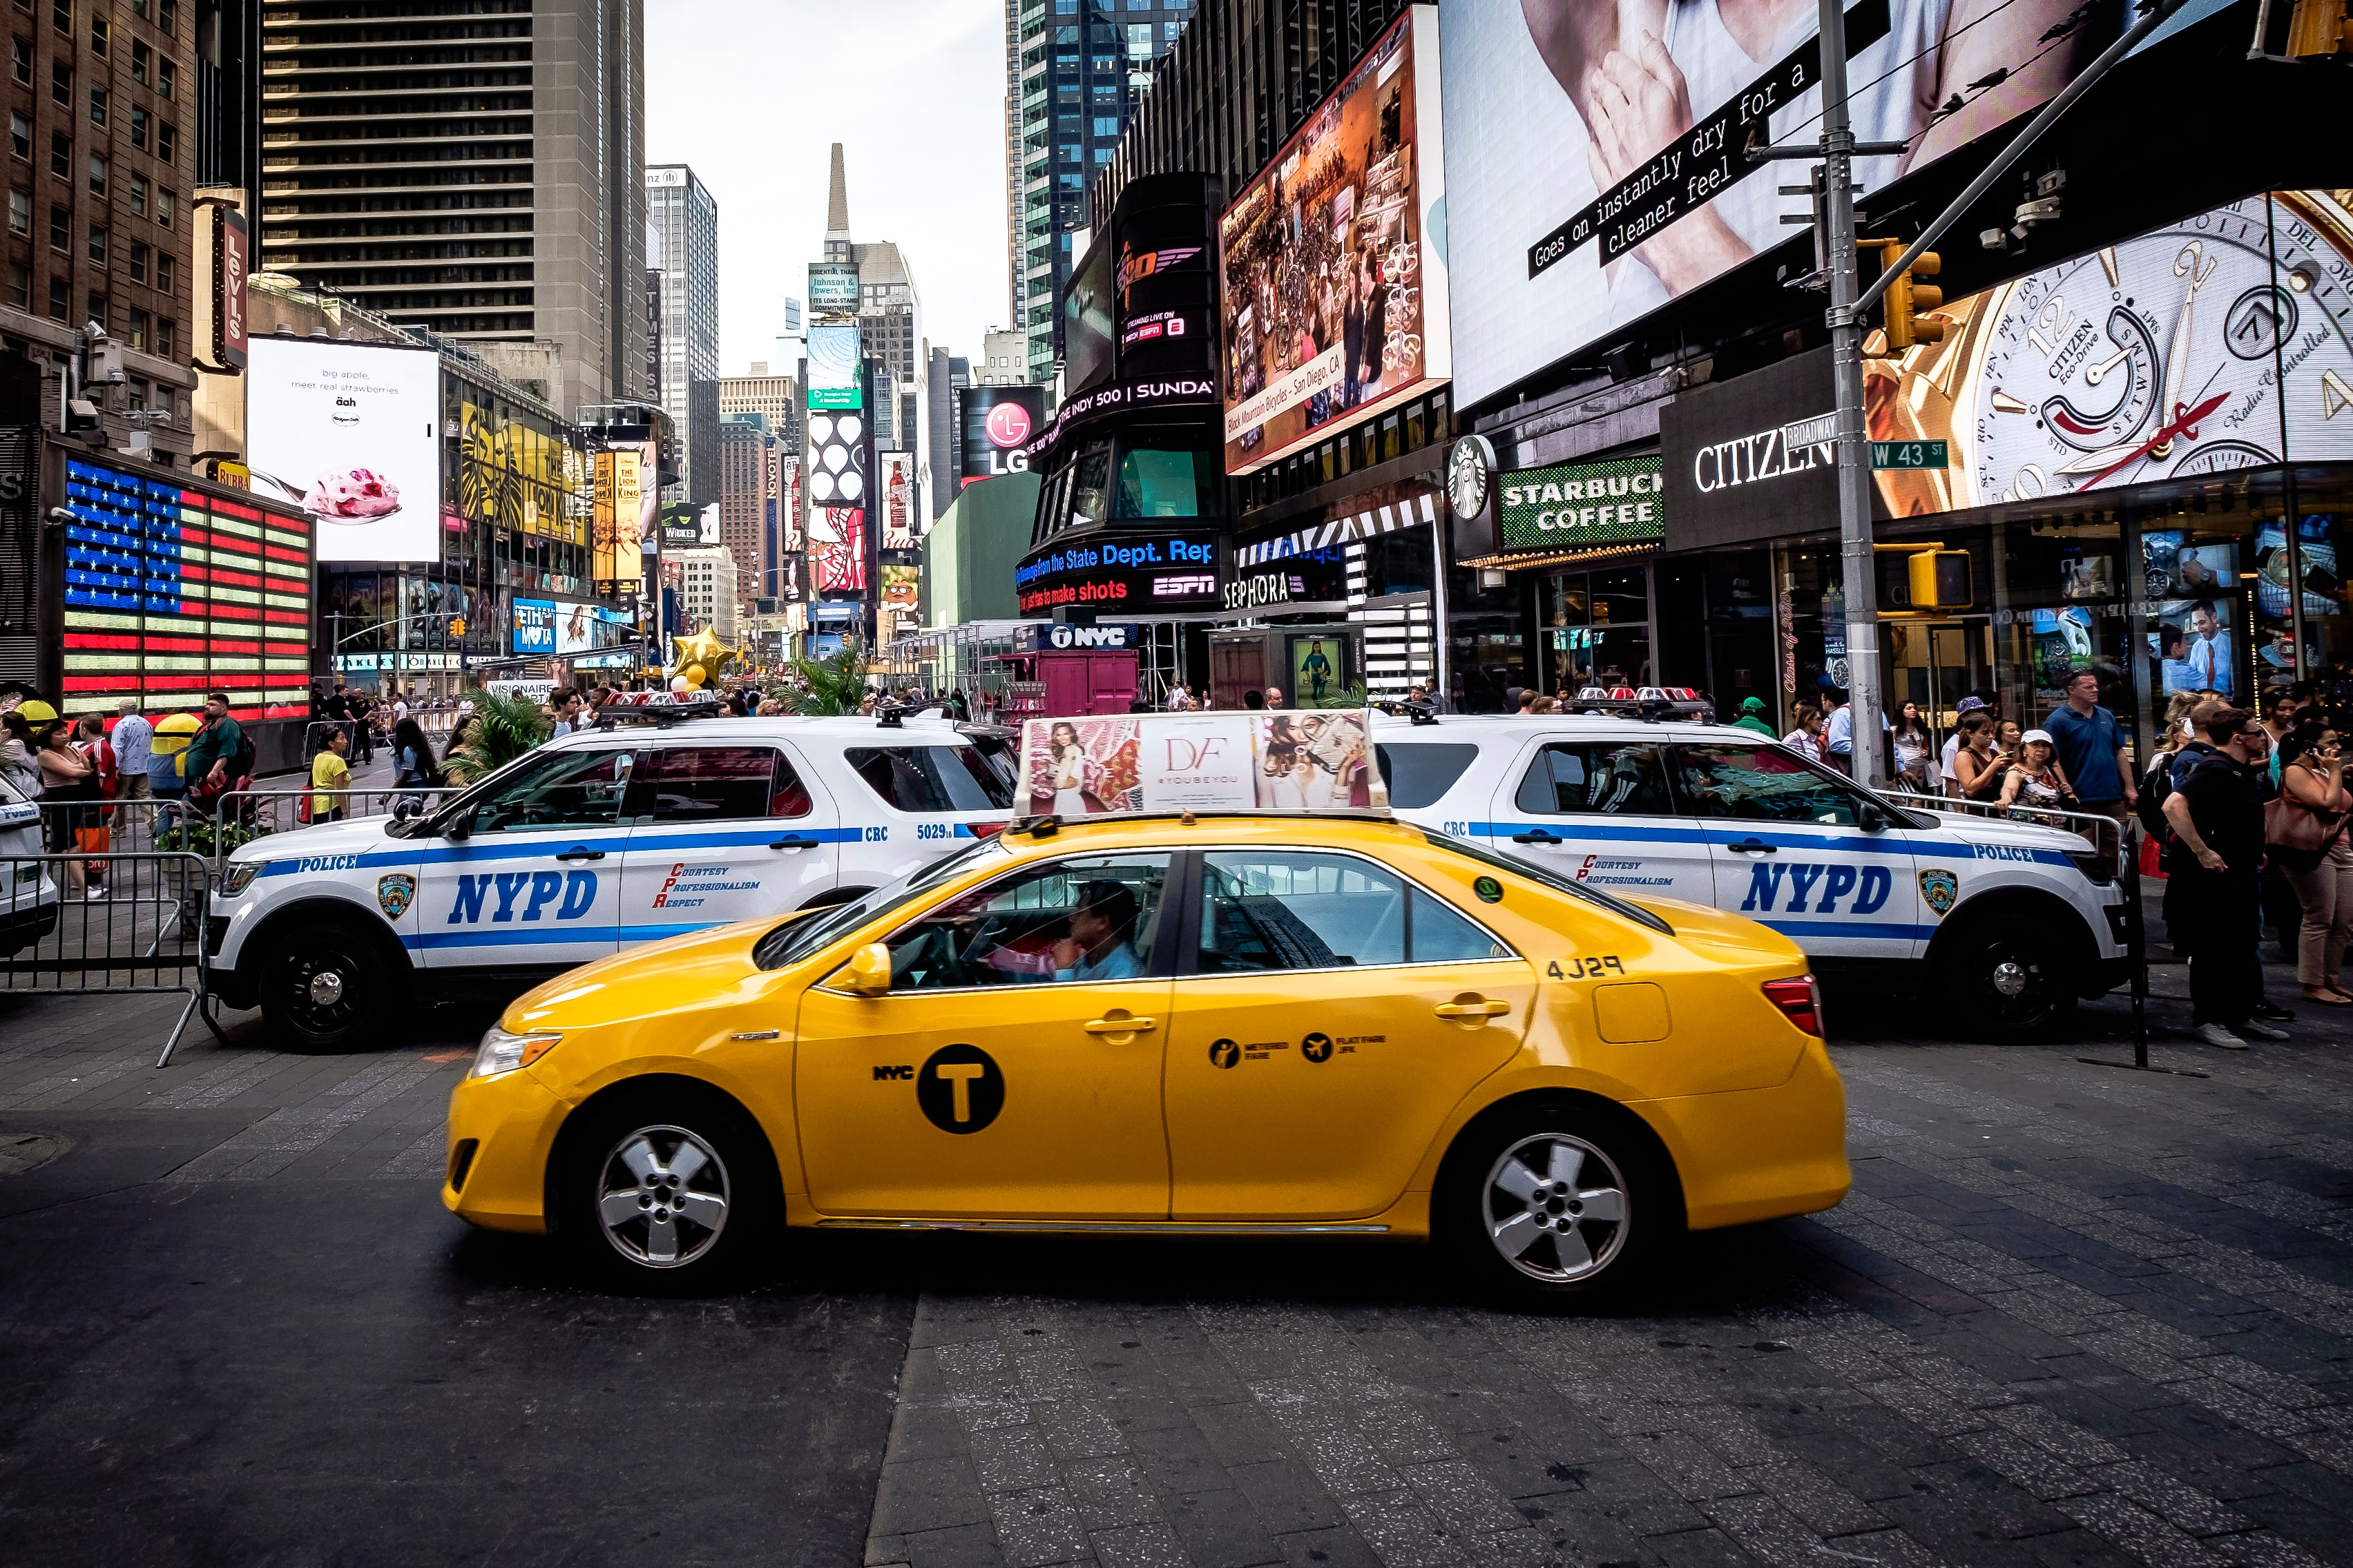 How Cronyism Created New York City's Taxi Medallion Bubble